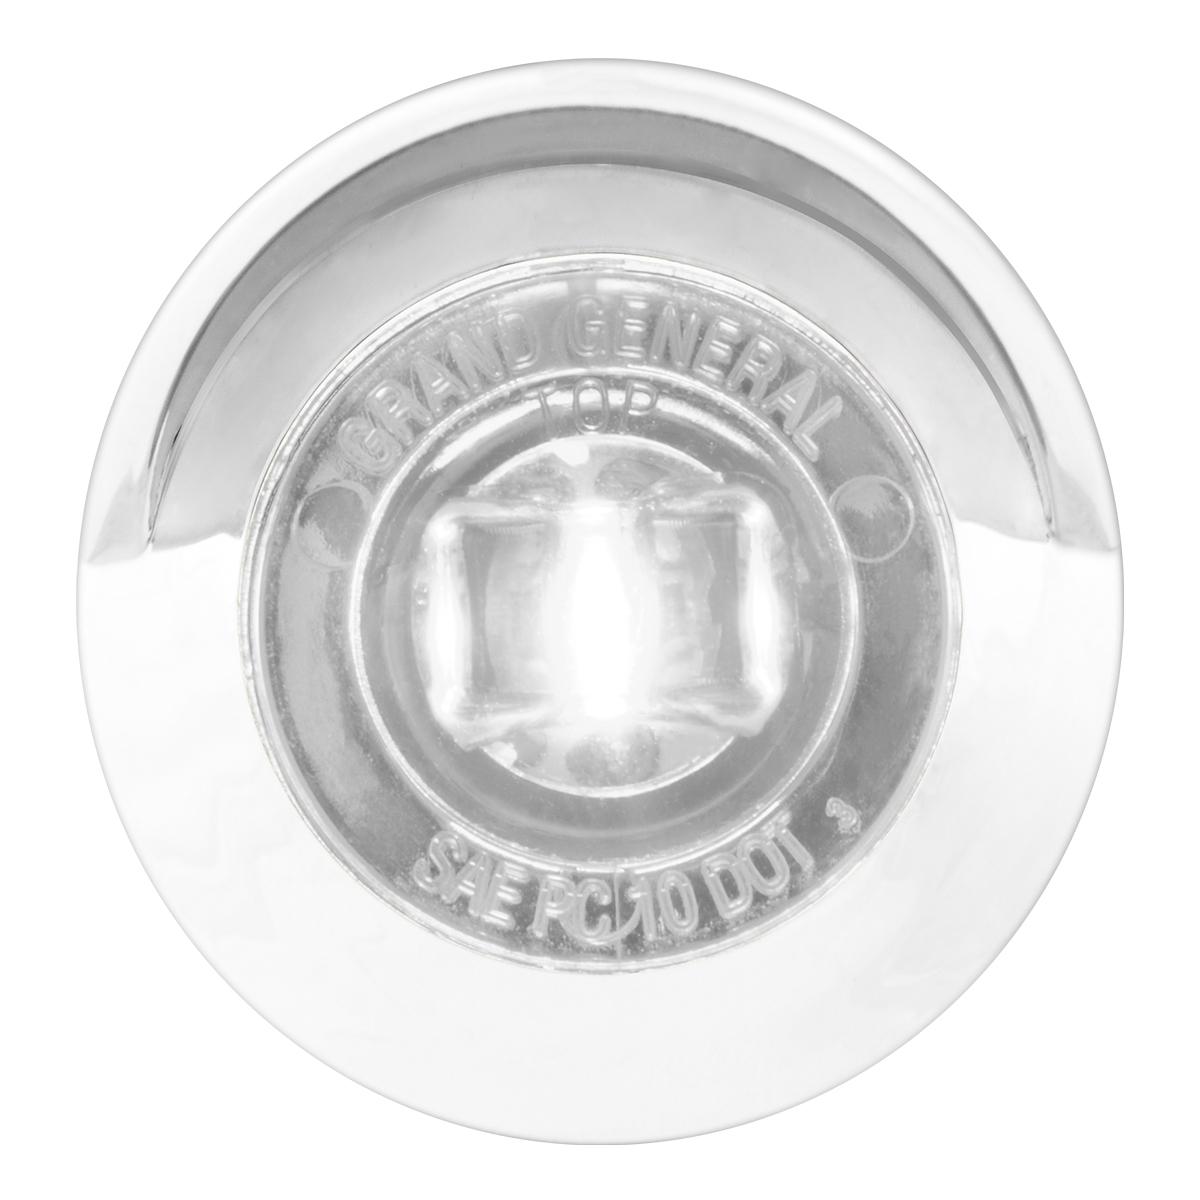 "75264 1"" Dual Function Mini Push/Screw-in Wide Angle LED Light w/ Chrome Bezel & Visor"